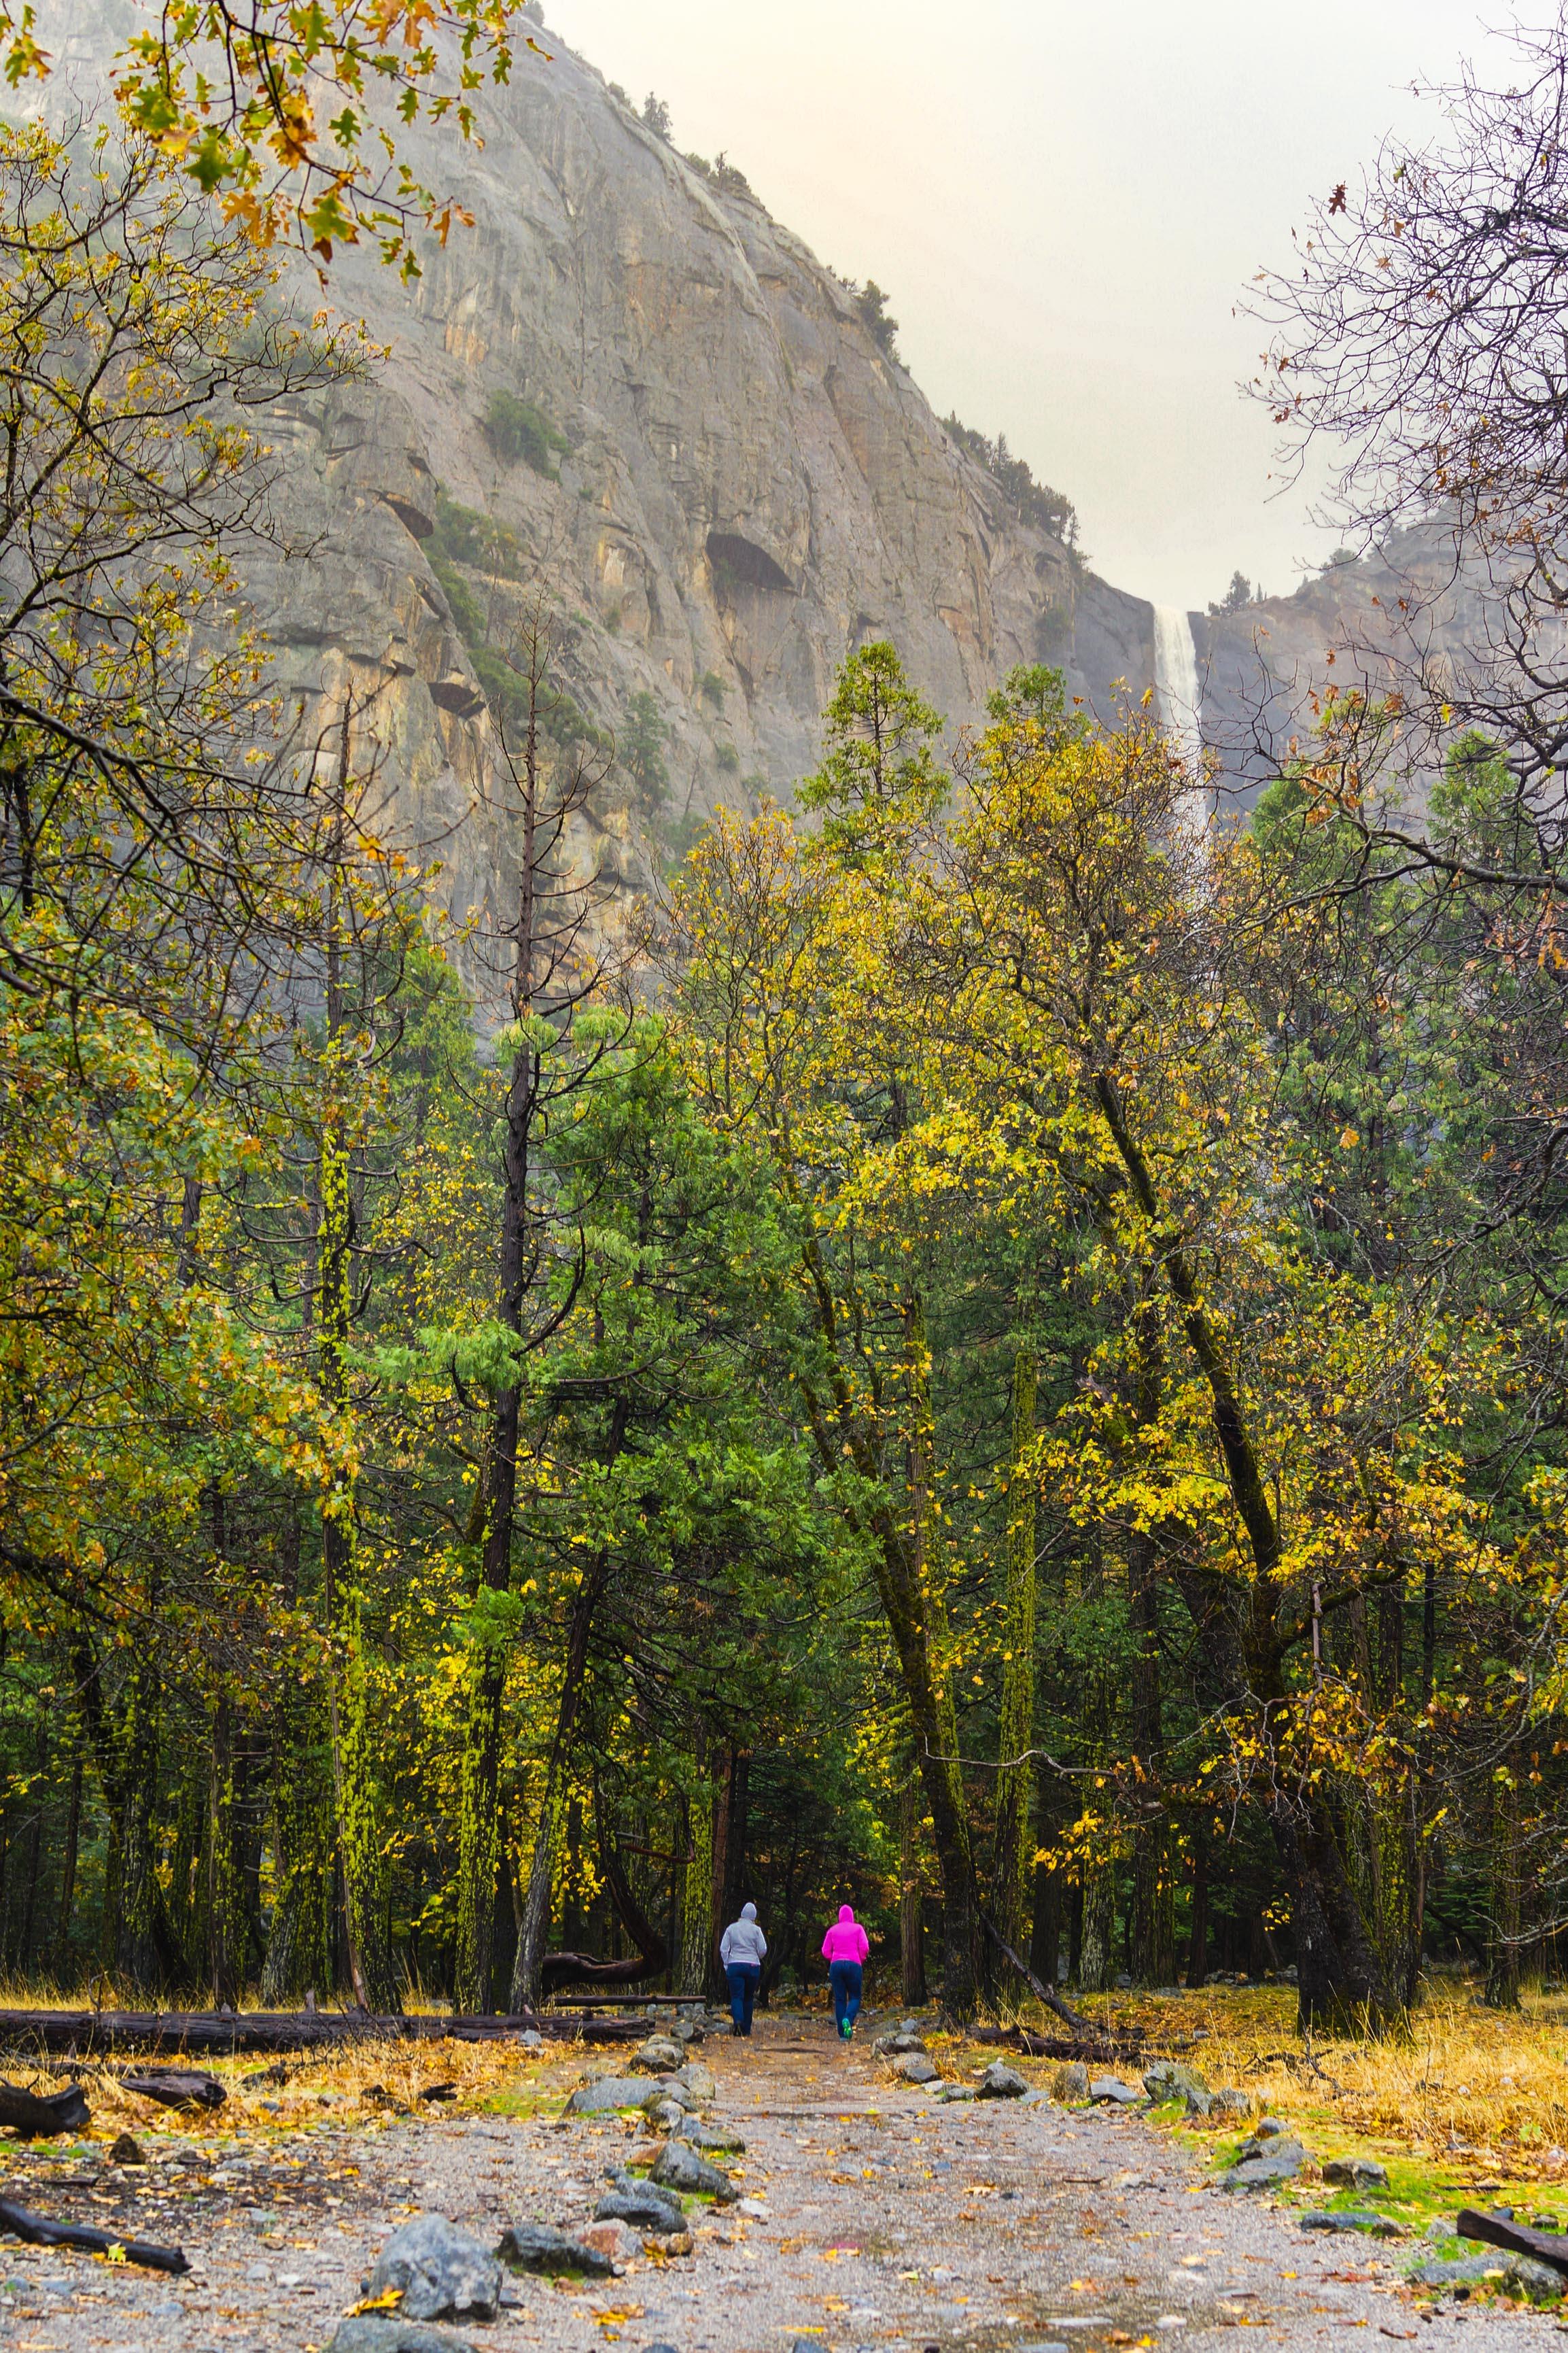 The trail to Bridalveil Fall.